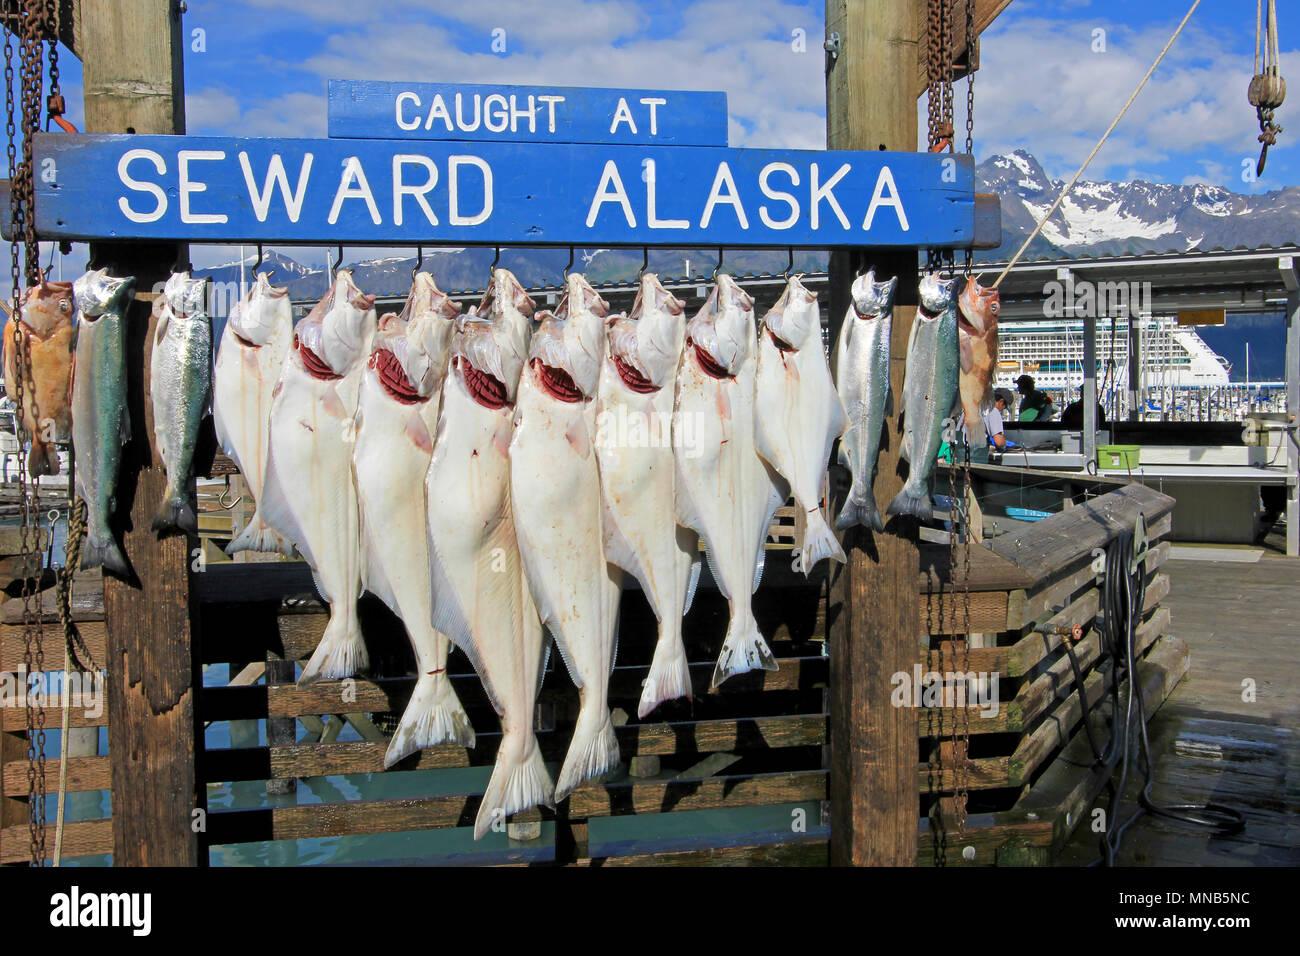 SEWARD, ALASKA, USA, JULY 18, 2014: The halibuts caught at Seward Alaska were hook for weighing in Seward, Alaska, USA on July 18, 2014 - Stock Image